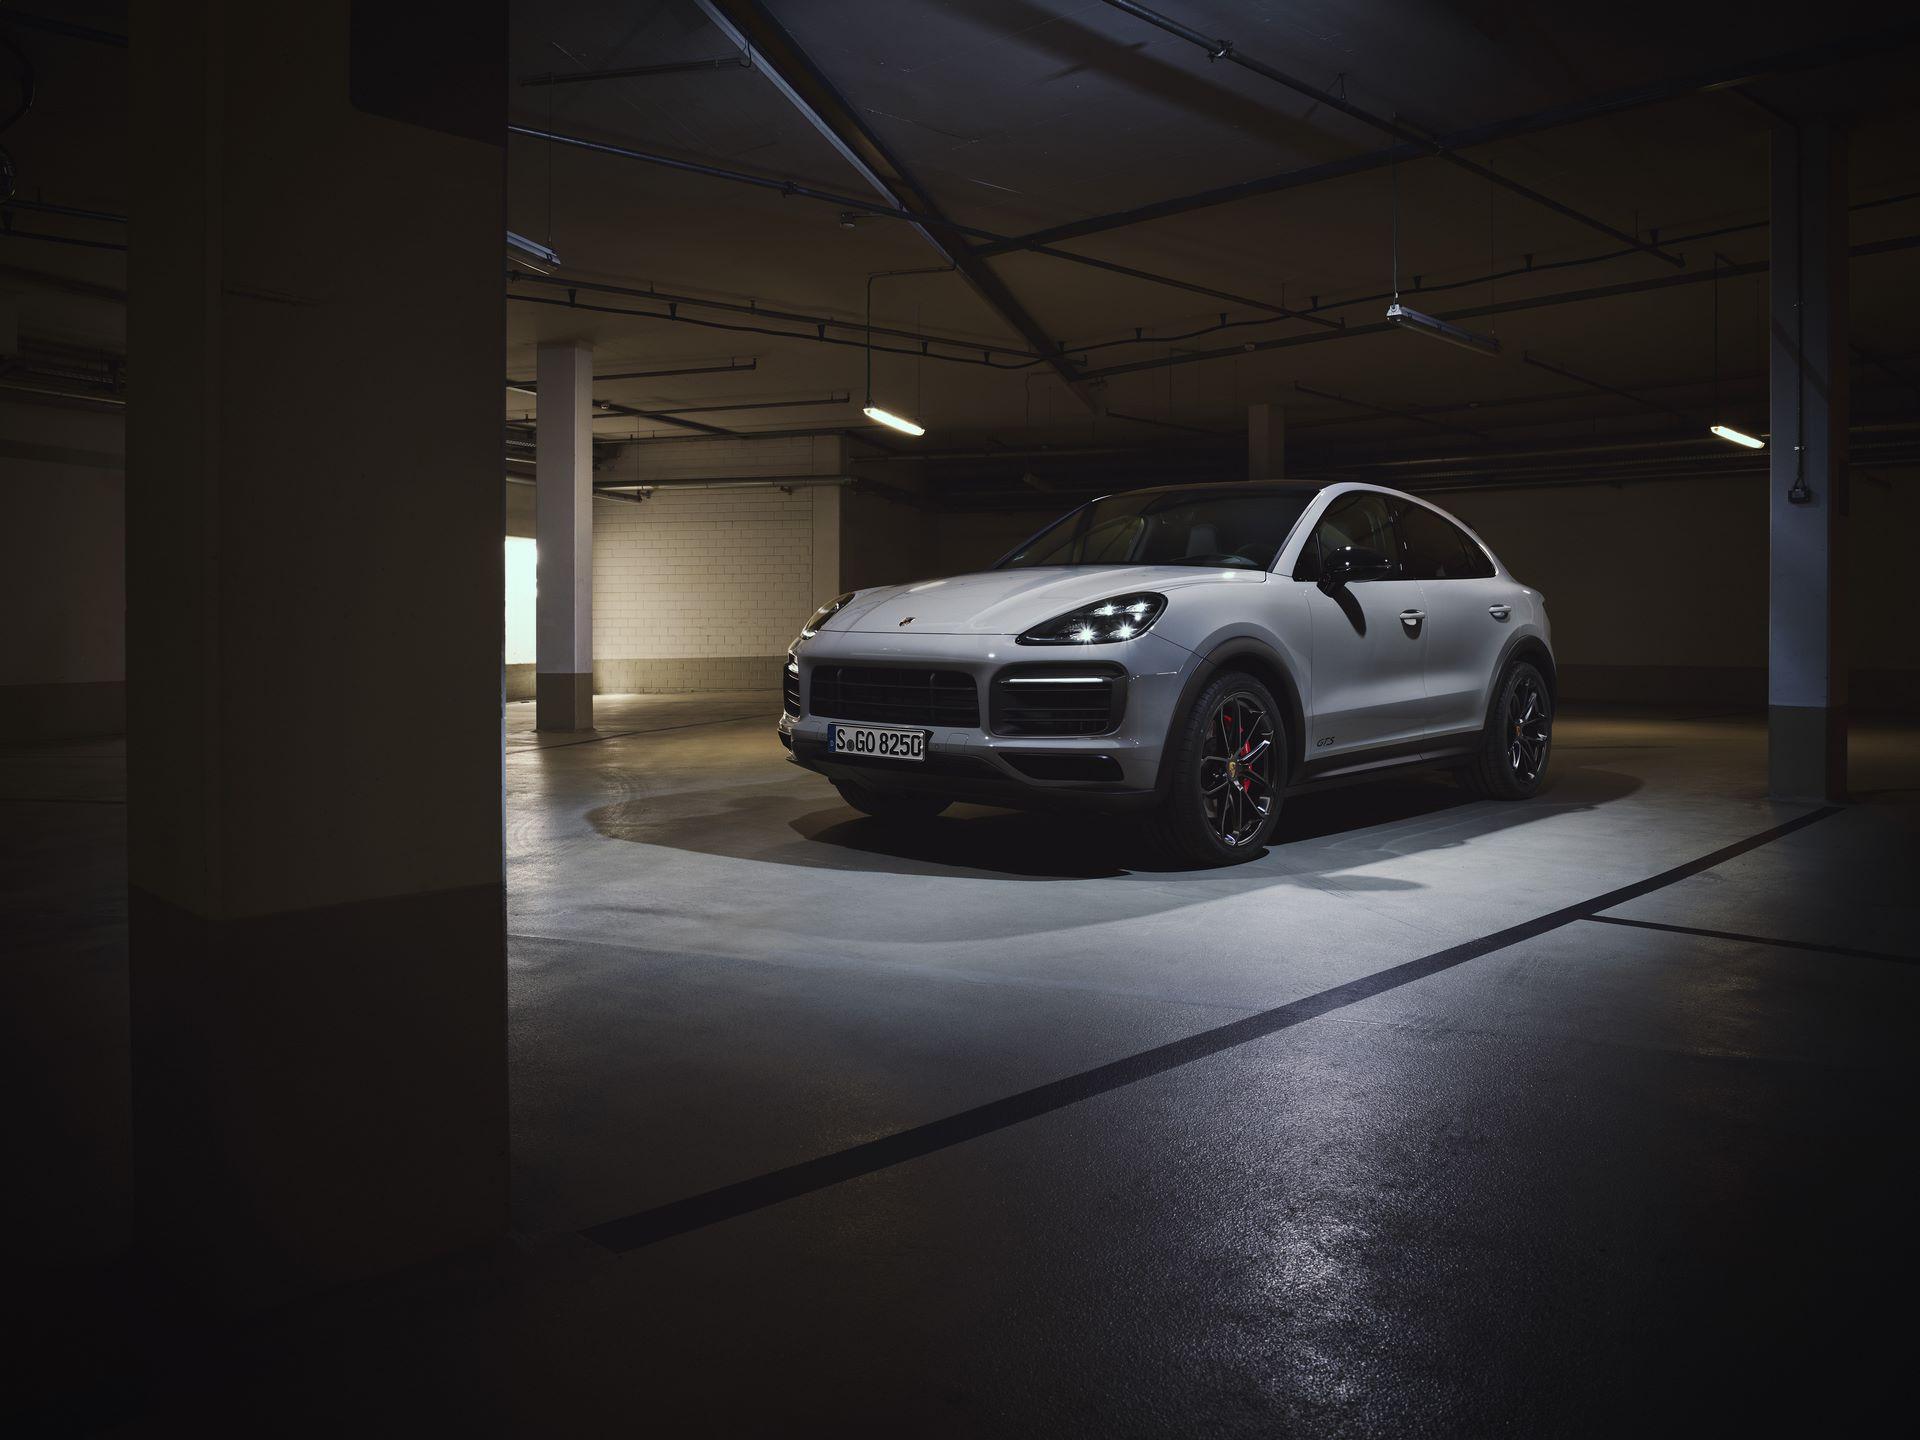 Porsche-Cayenne-GTS-and-Cayenne-GTS-Coupe-2021-1